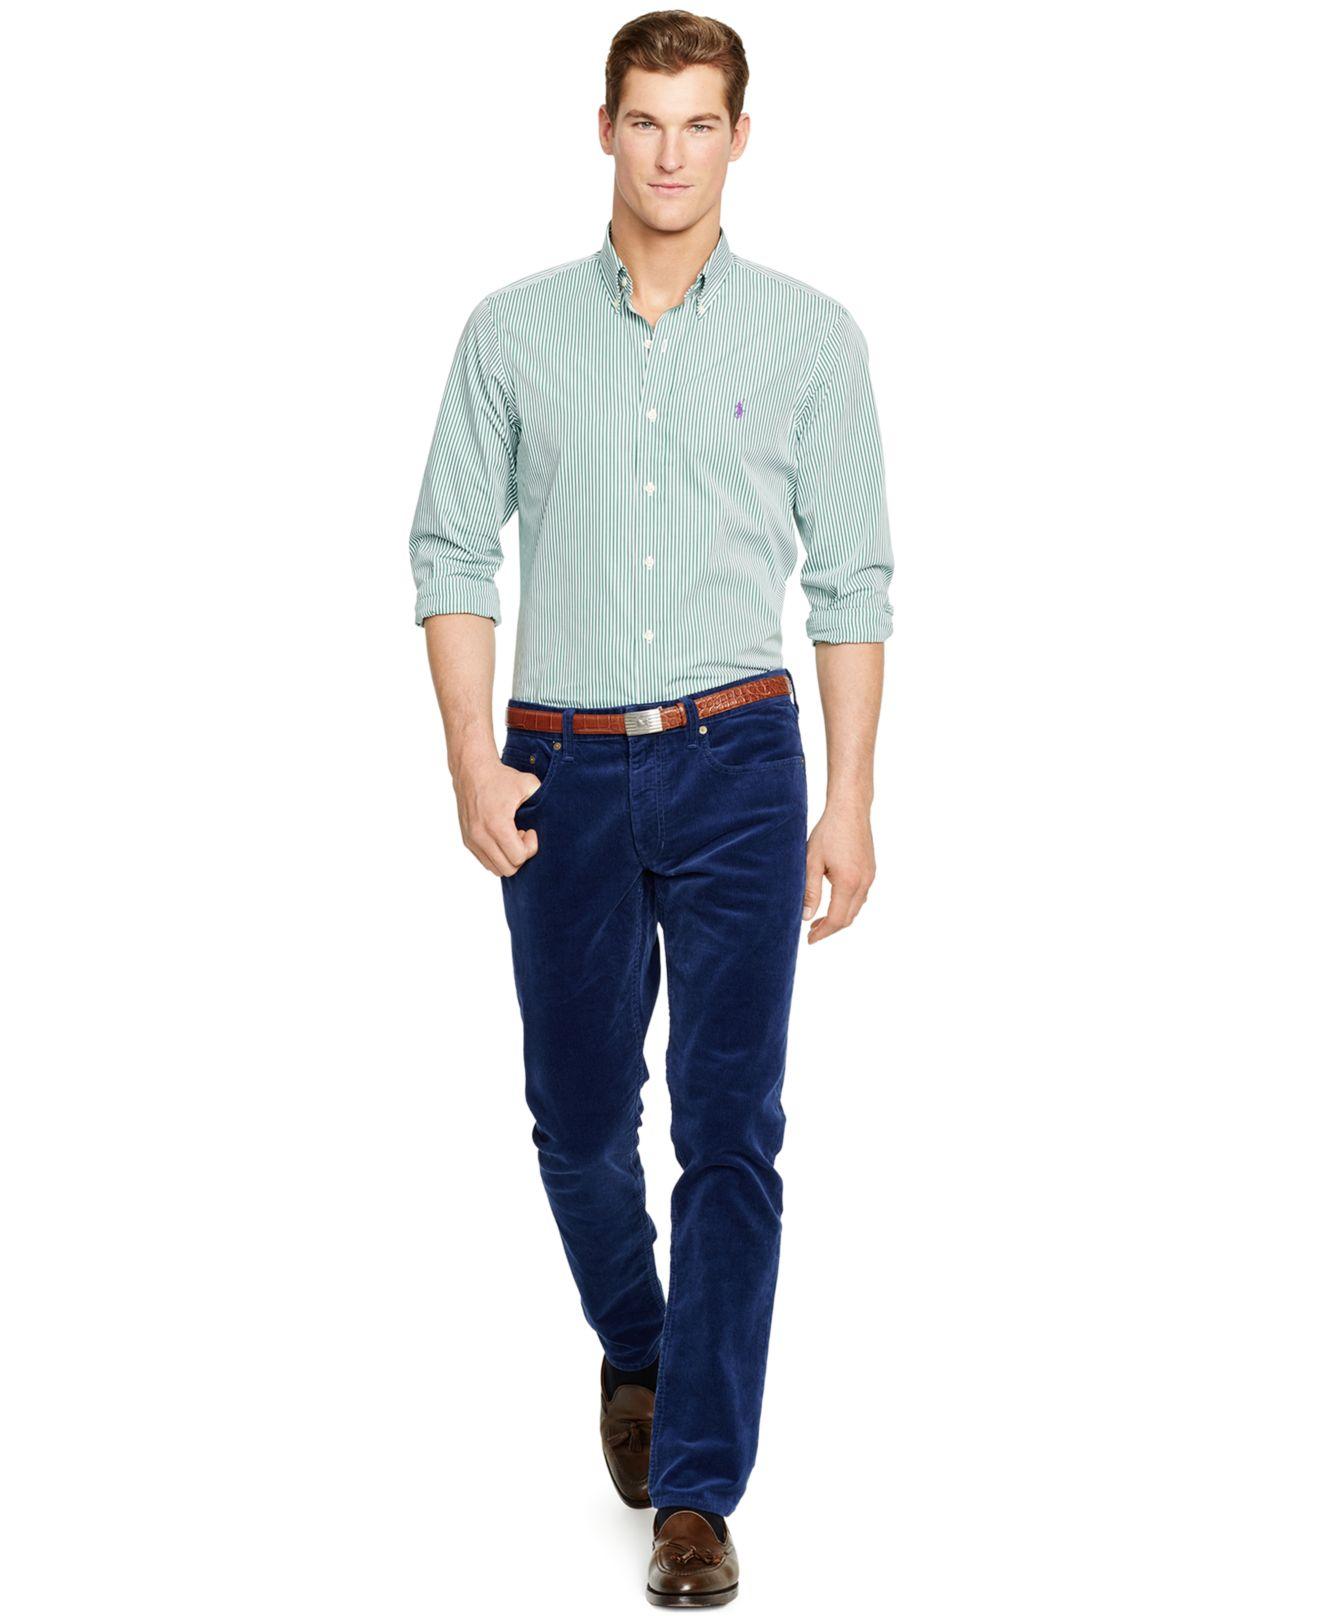 ed3873ad99 ... promo code for lyst polo ralph lauren striped poplin shirt in green for  men 97685 ec99a